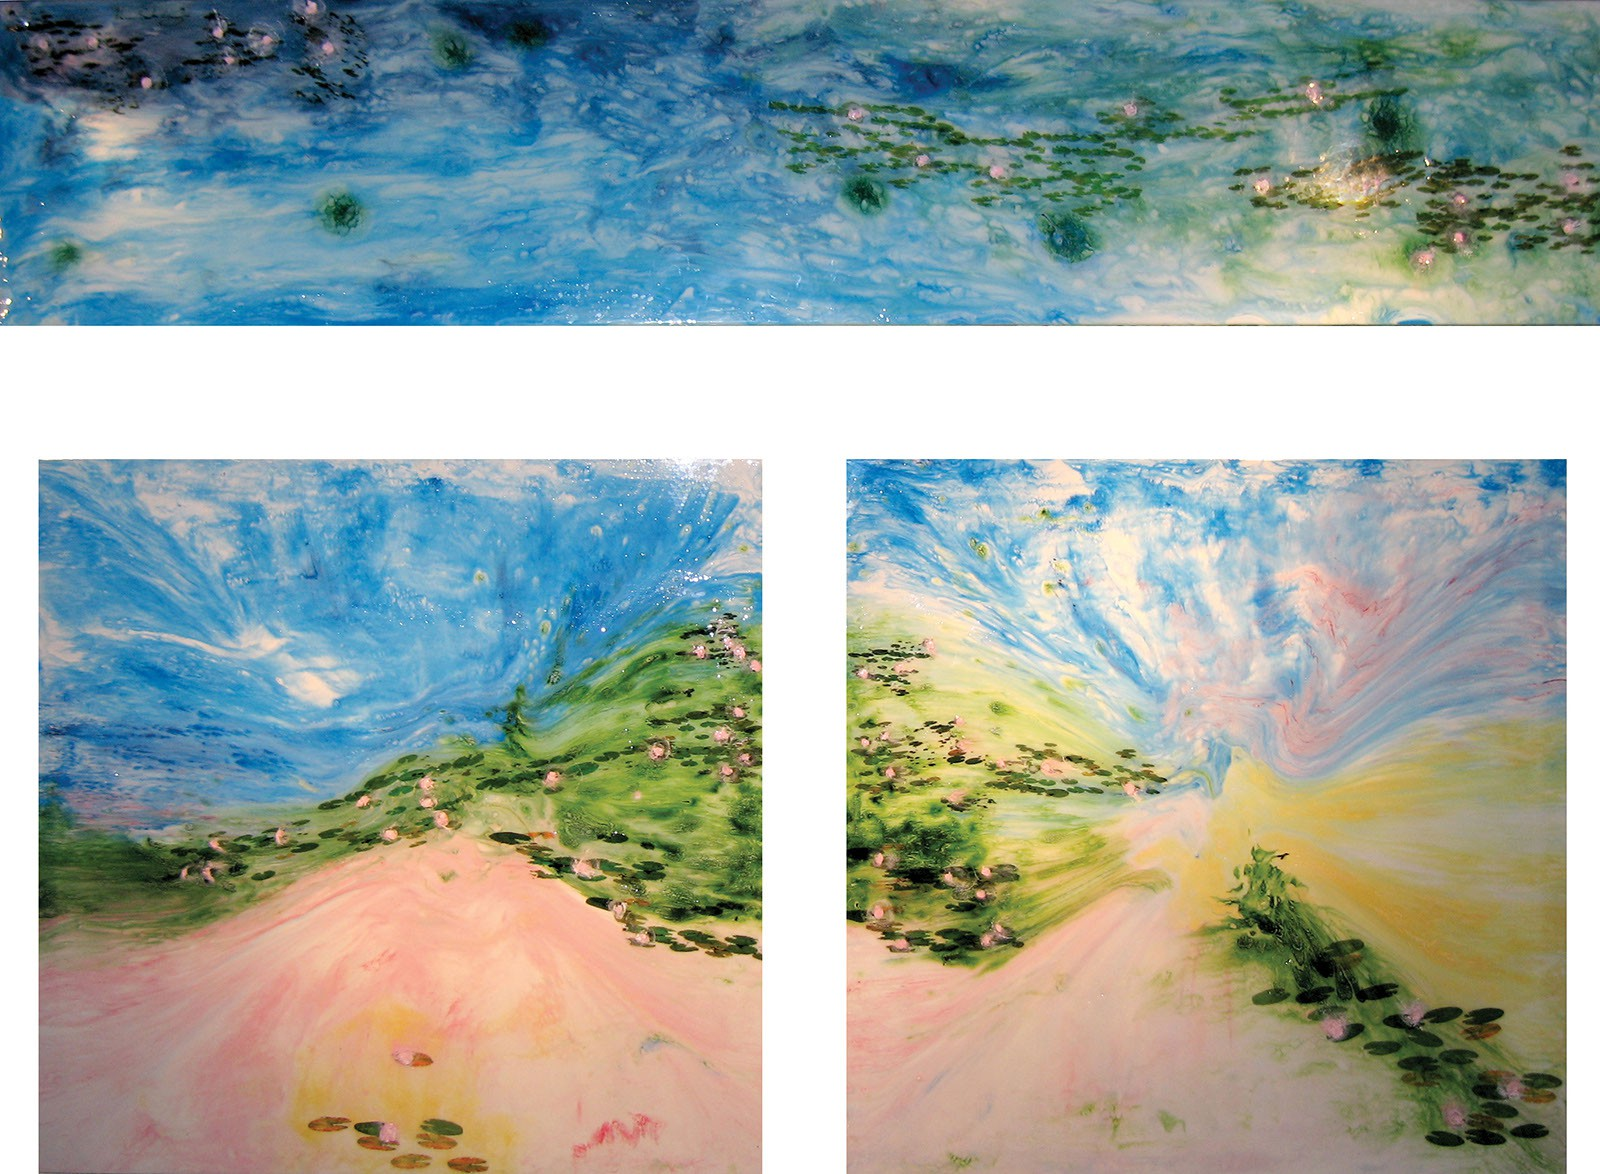 "Water Lilies #1-3, Triptych, 2007 14"" x 68"", (2) 49"" x 49"" - Liquid Plastic, Porcelainizer, Acetate Prints and Oil Paint Mixture on Glass. Back-Lit Glass Painting. SOLD"